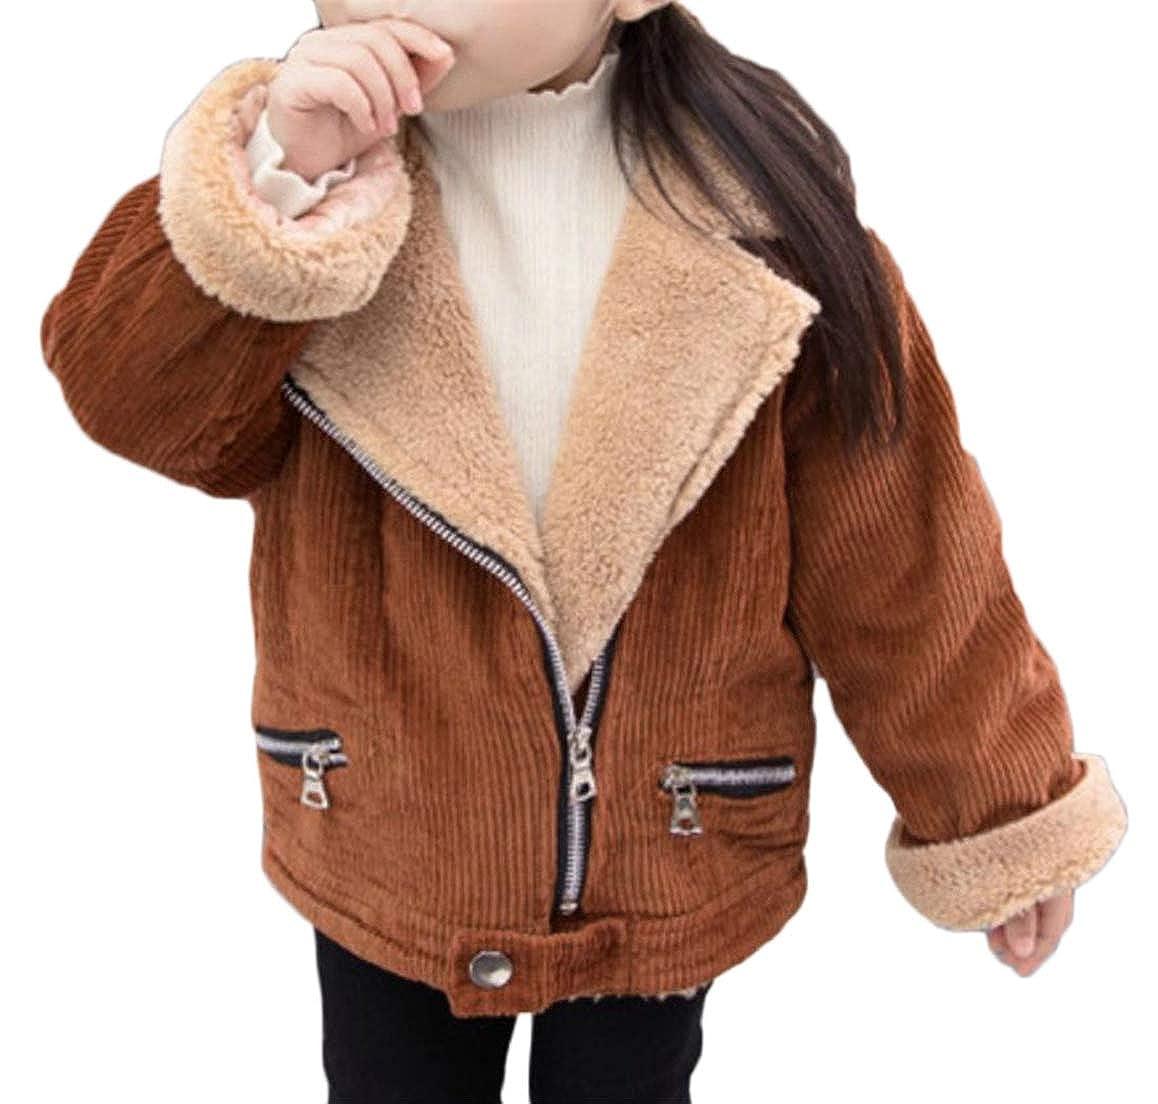 Cromoncent Girls Corduroy Lapel Sherpa Outdoors Fleece Parka Coat